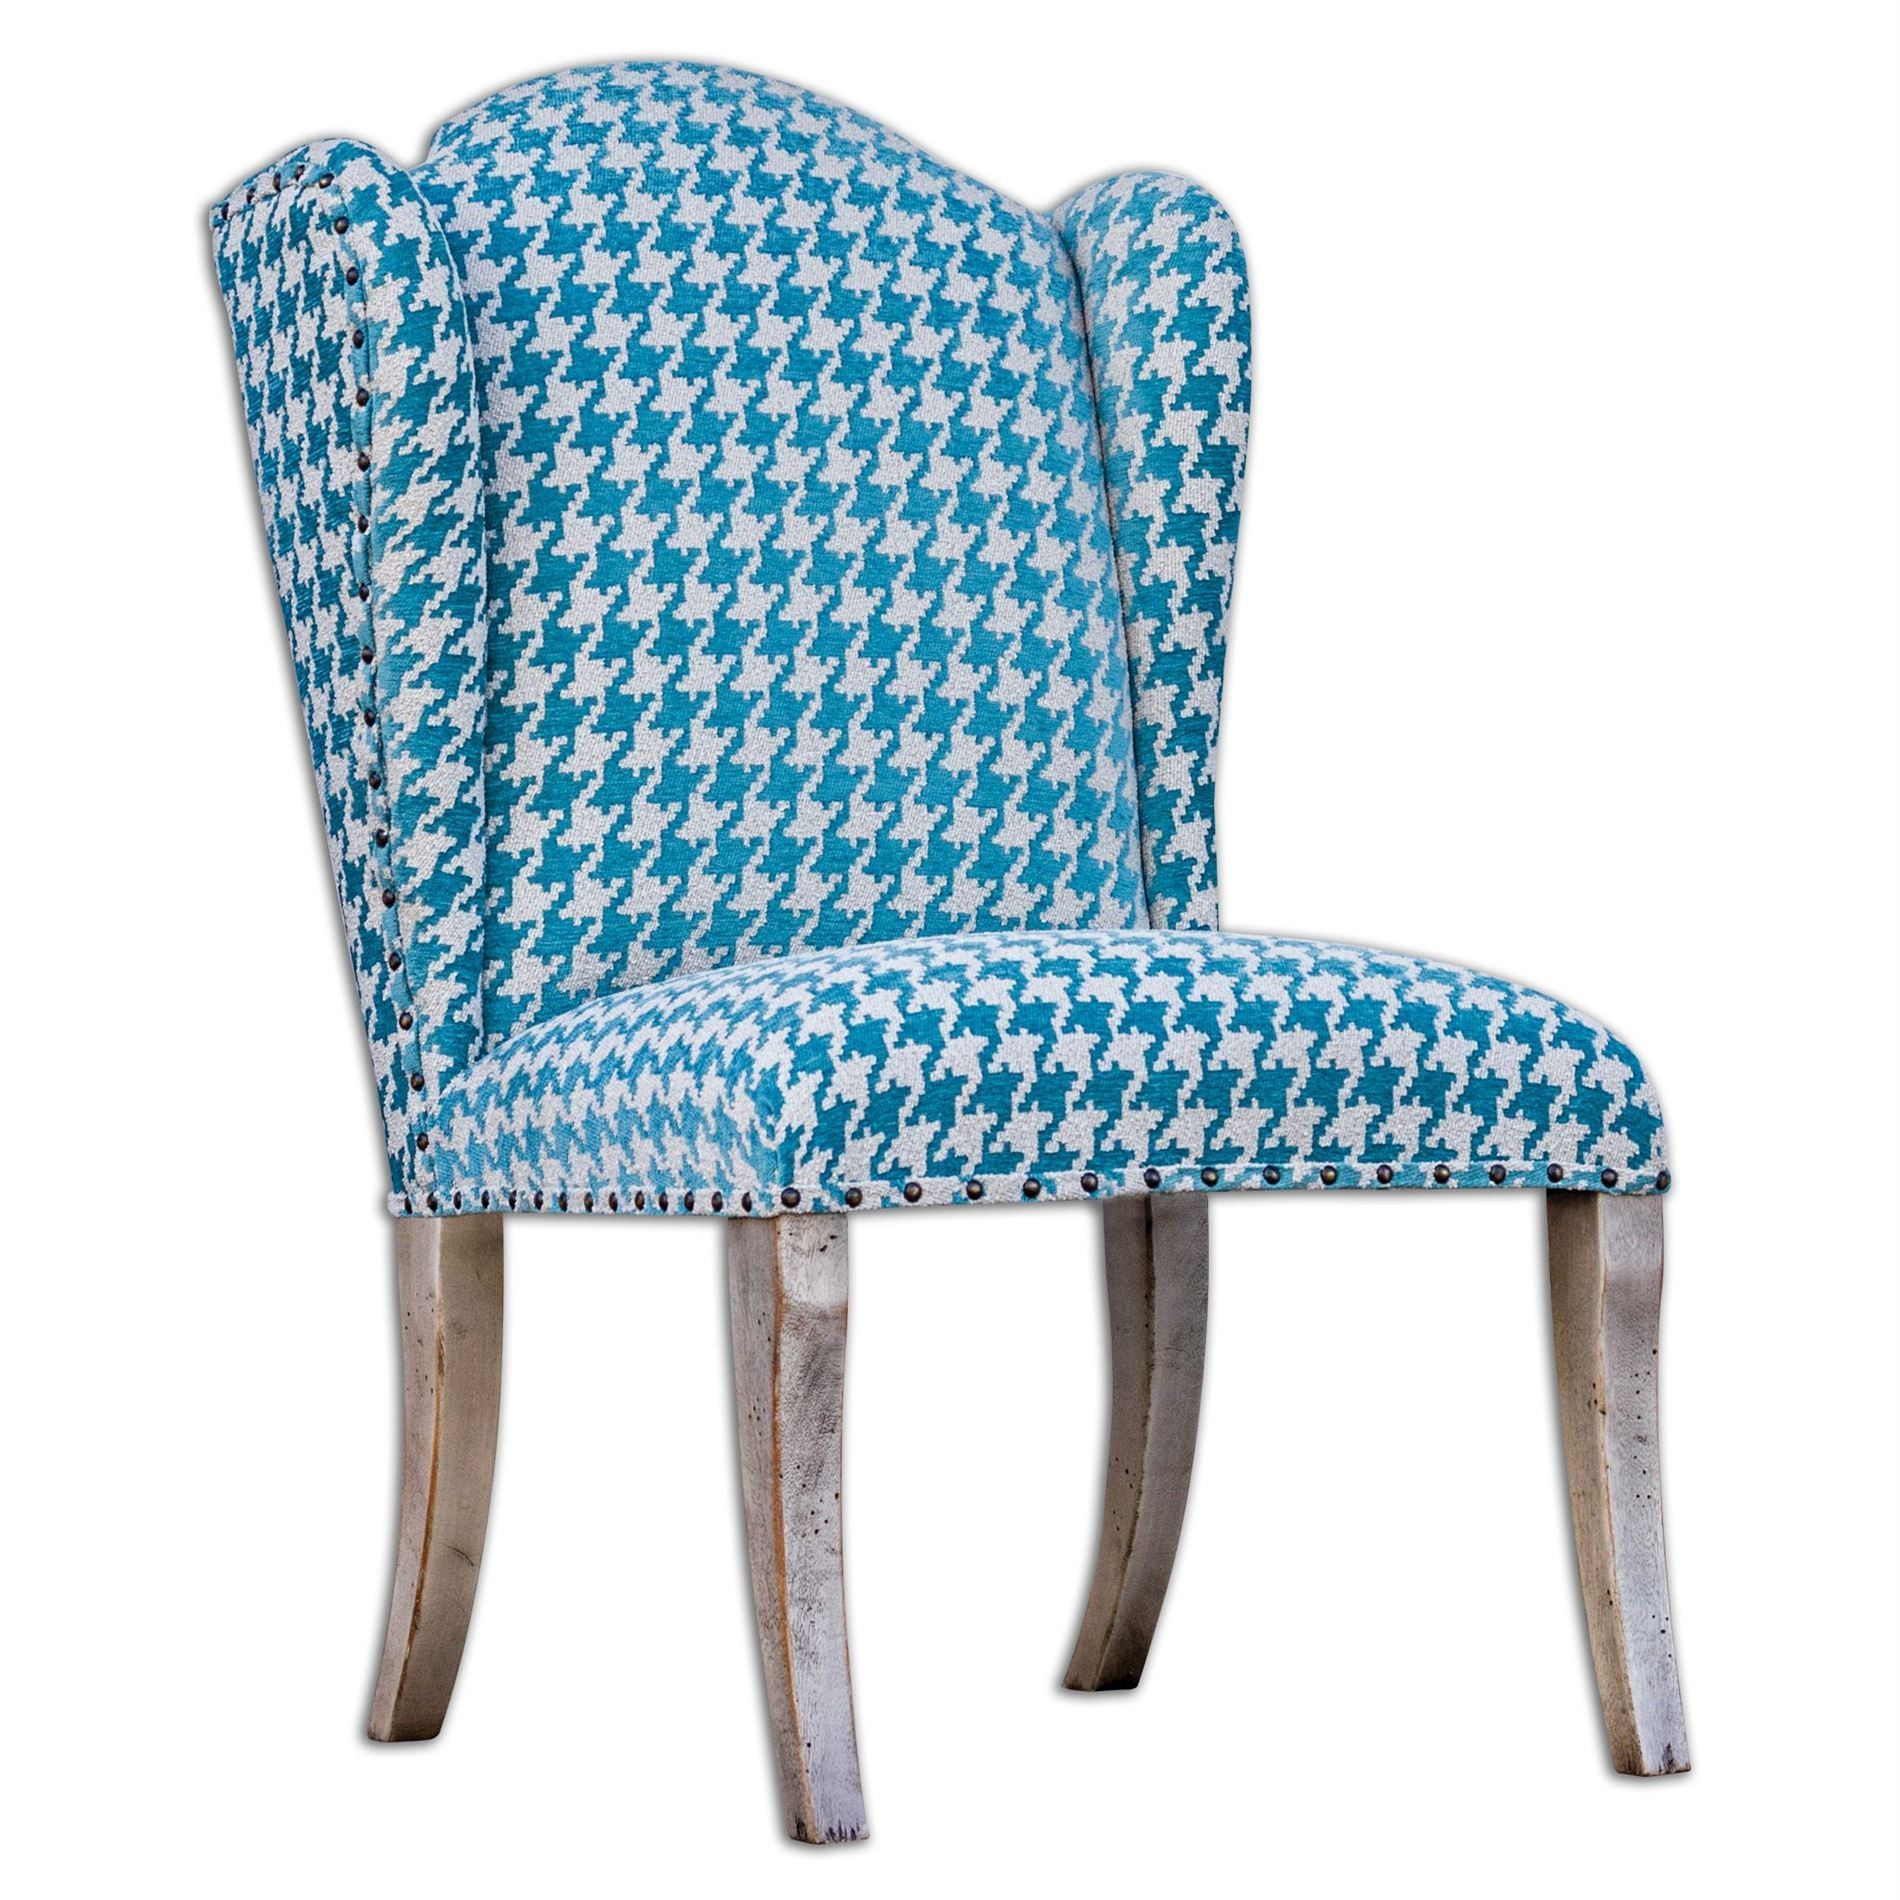 Winesett Blue Armless Chair By Uttermost #shophomedecor #homeaccessories